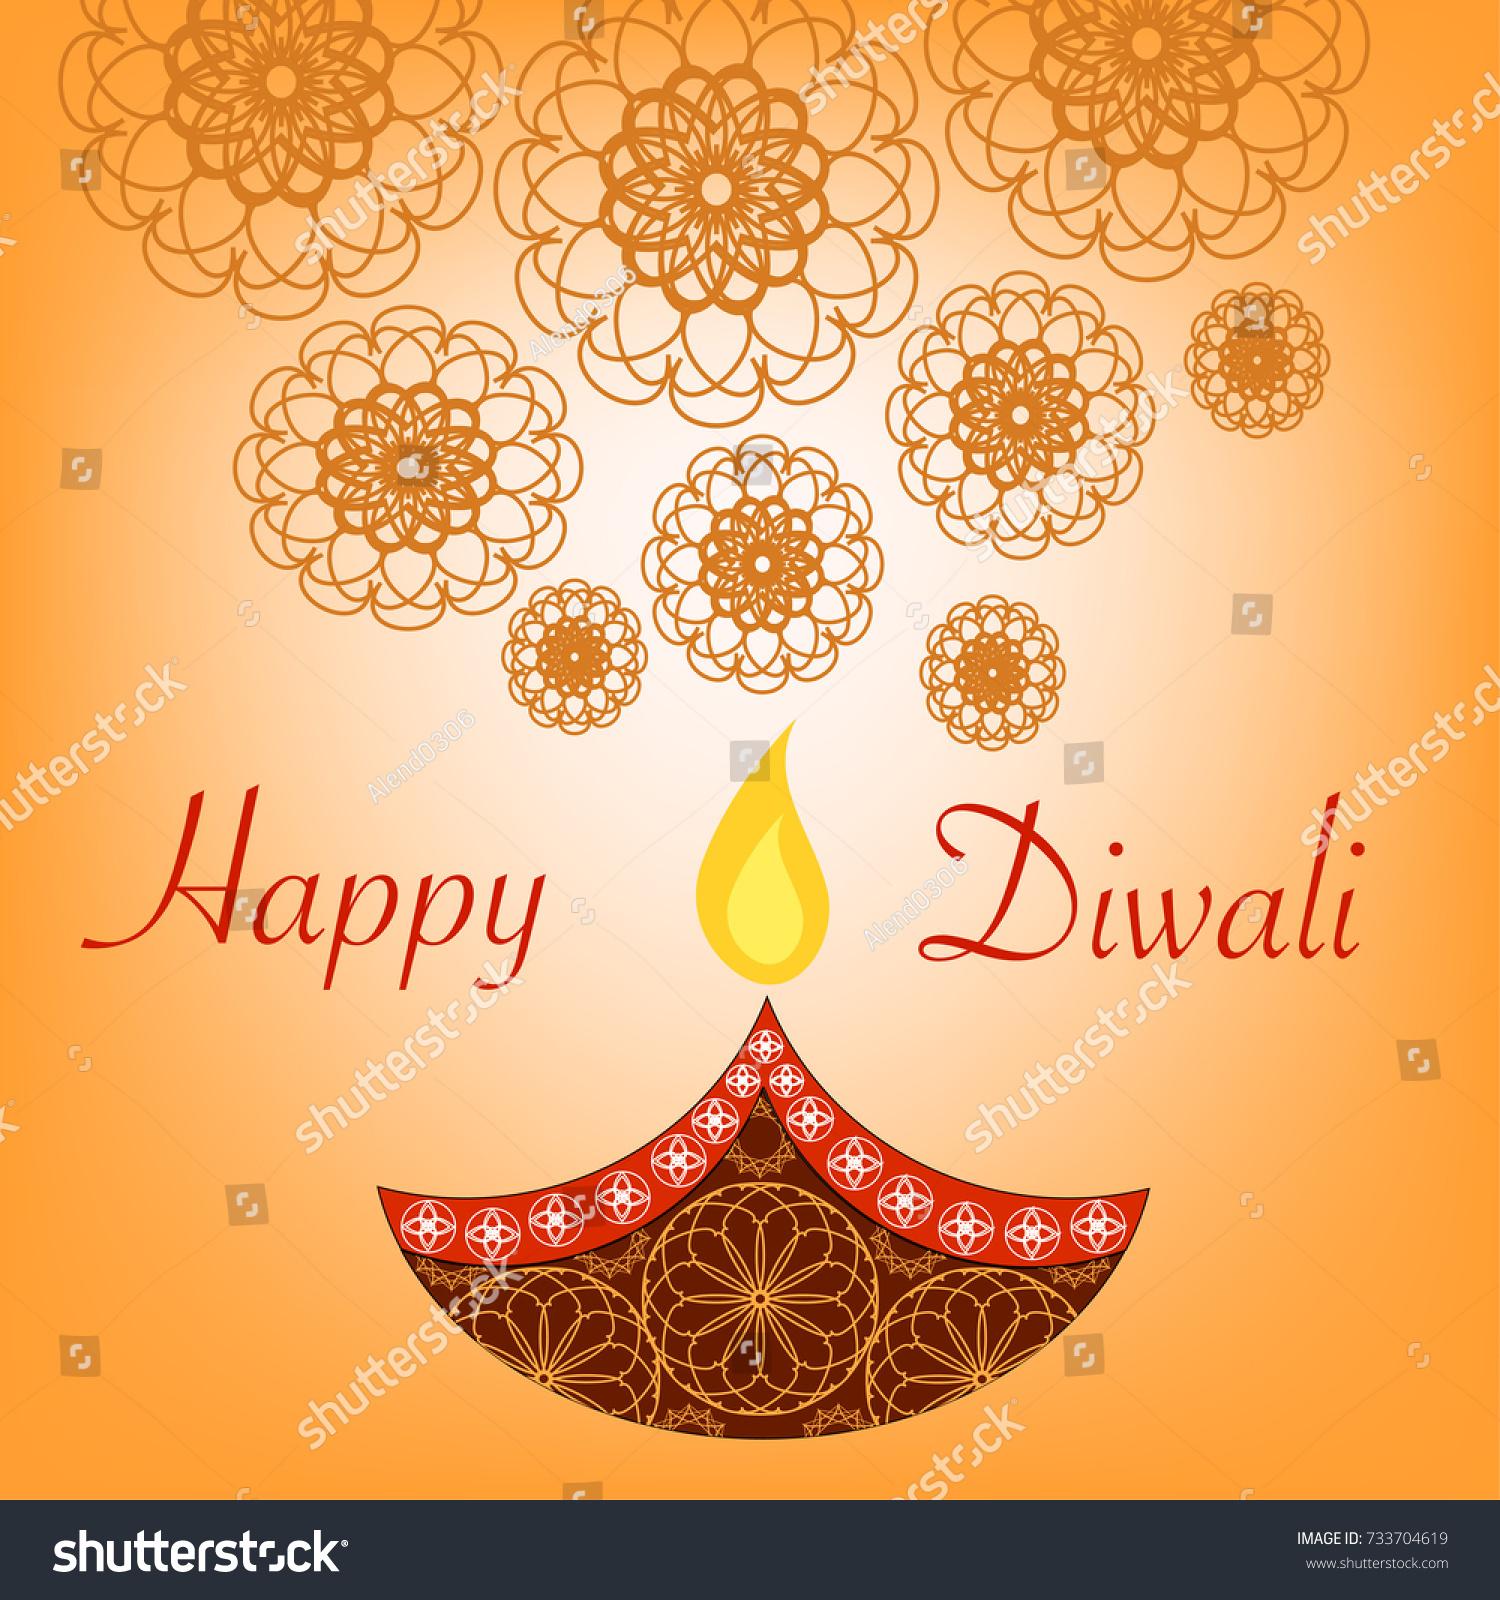 Beautiful Diwali Vector Card Greetings Diwali Stock Vector Royalty